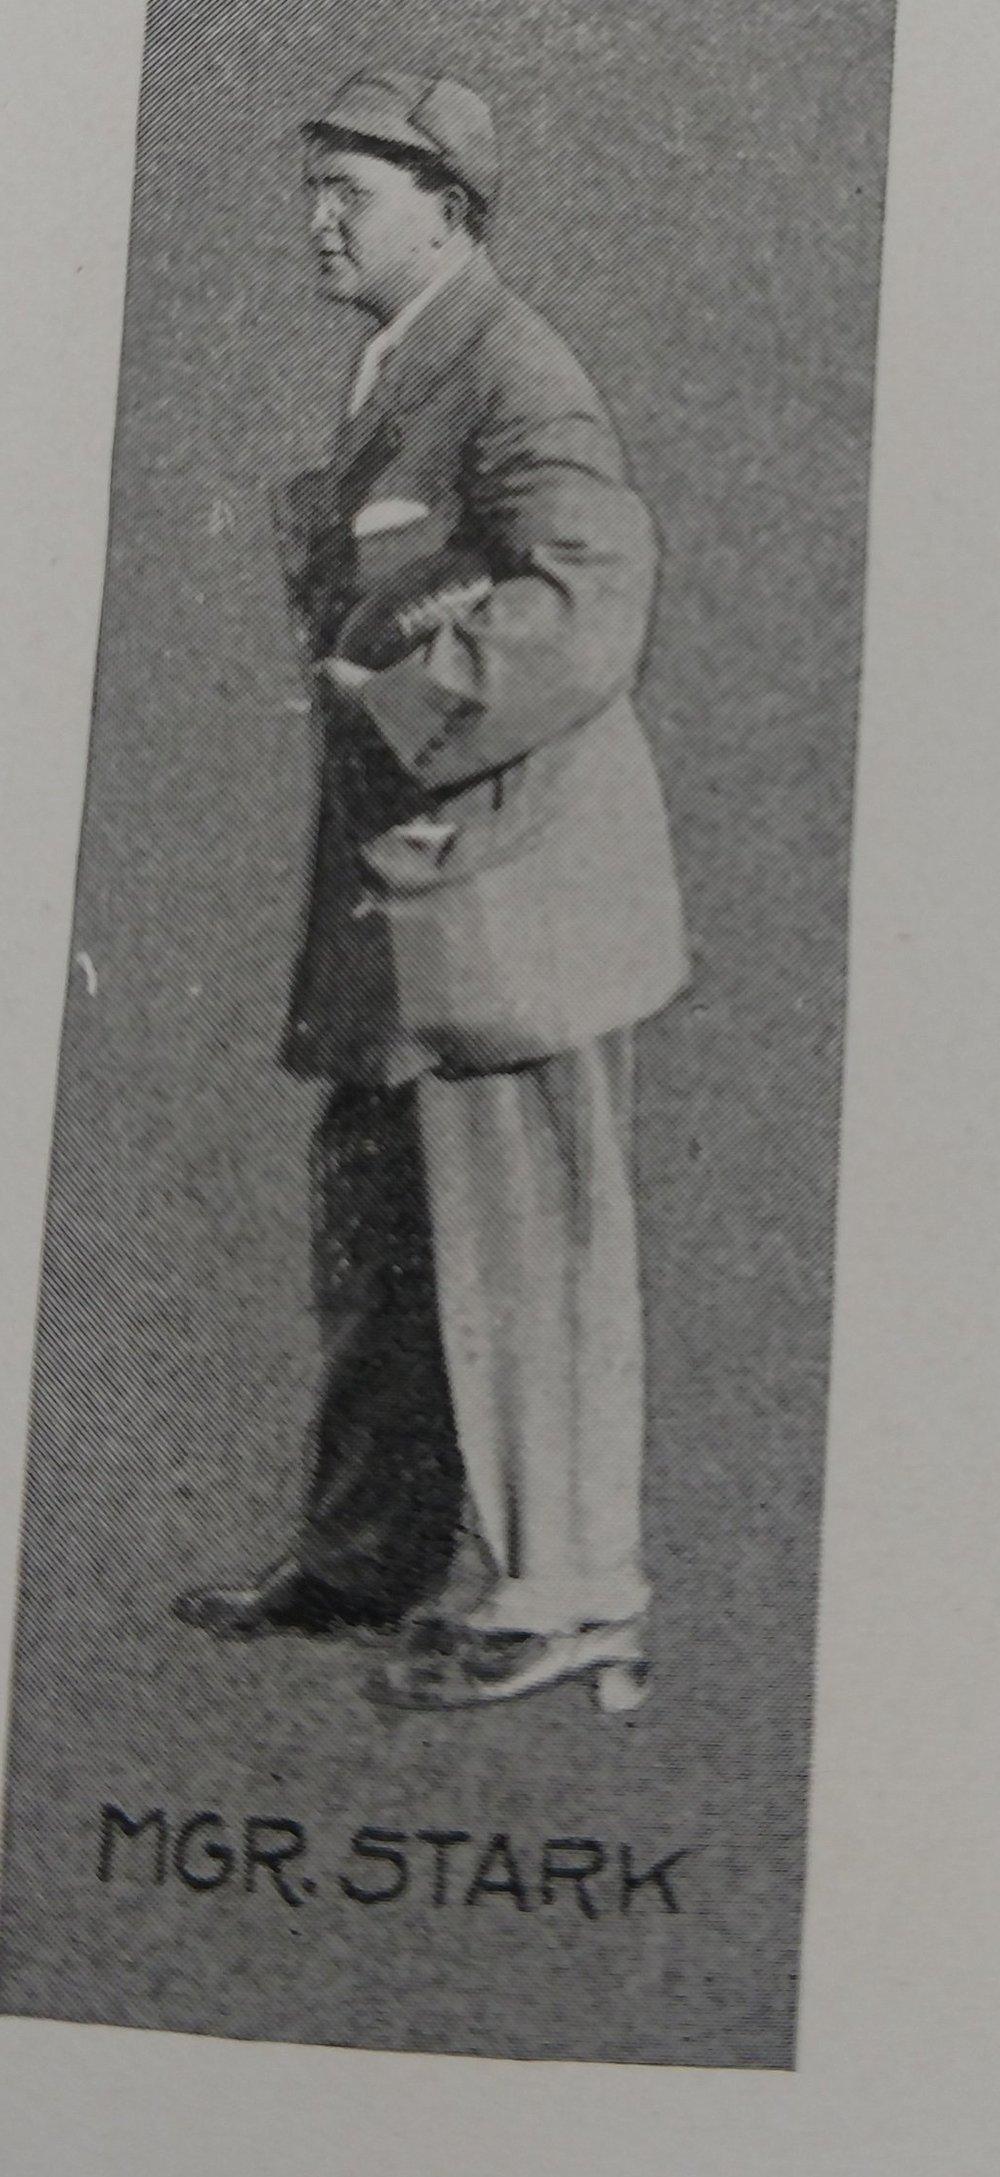 1911 mgr. stark.jpg